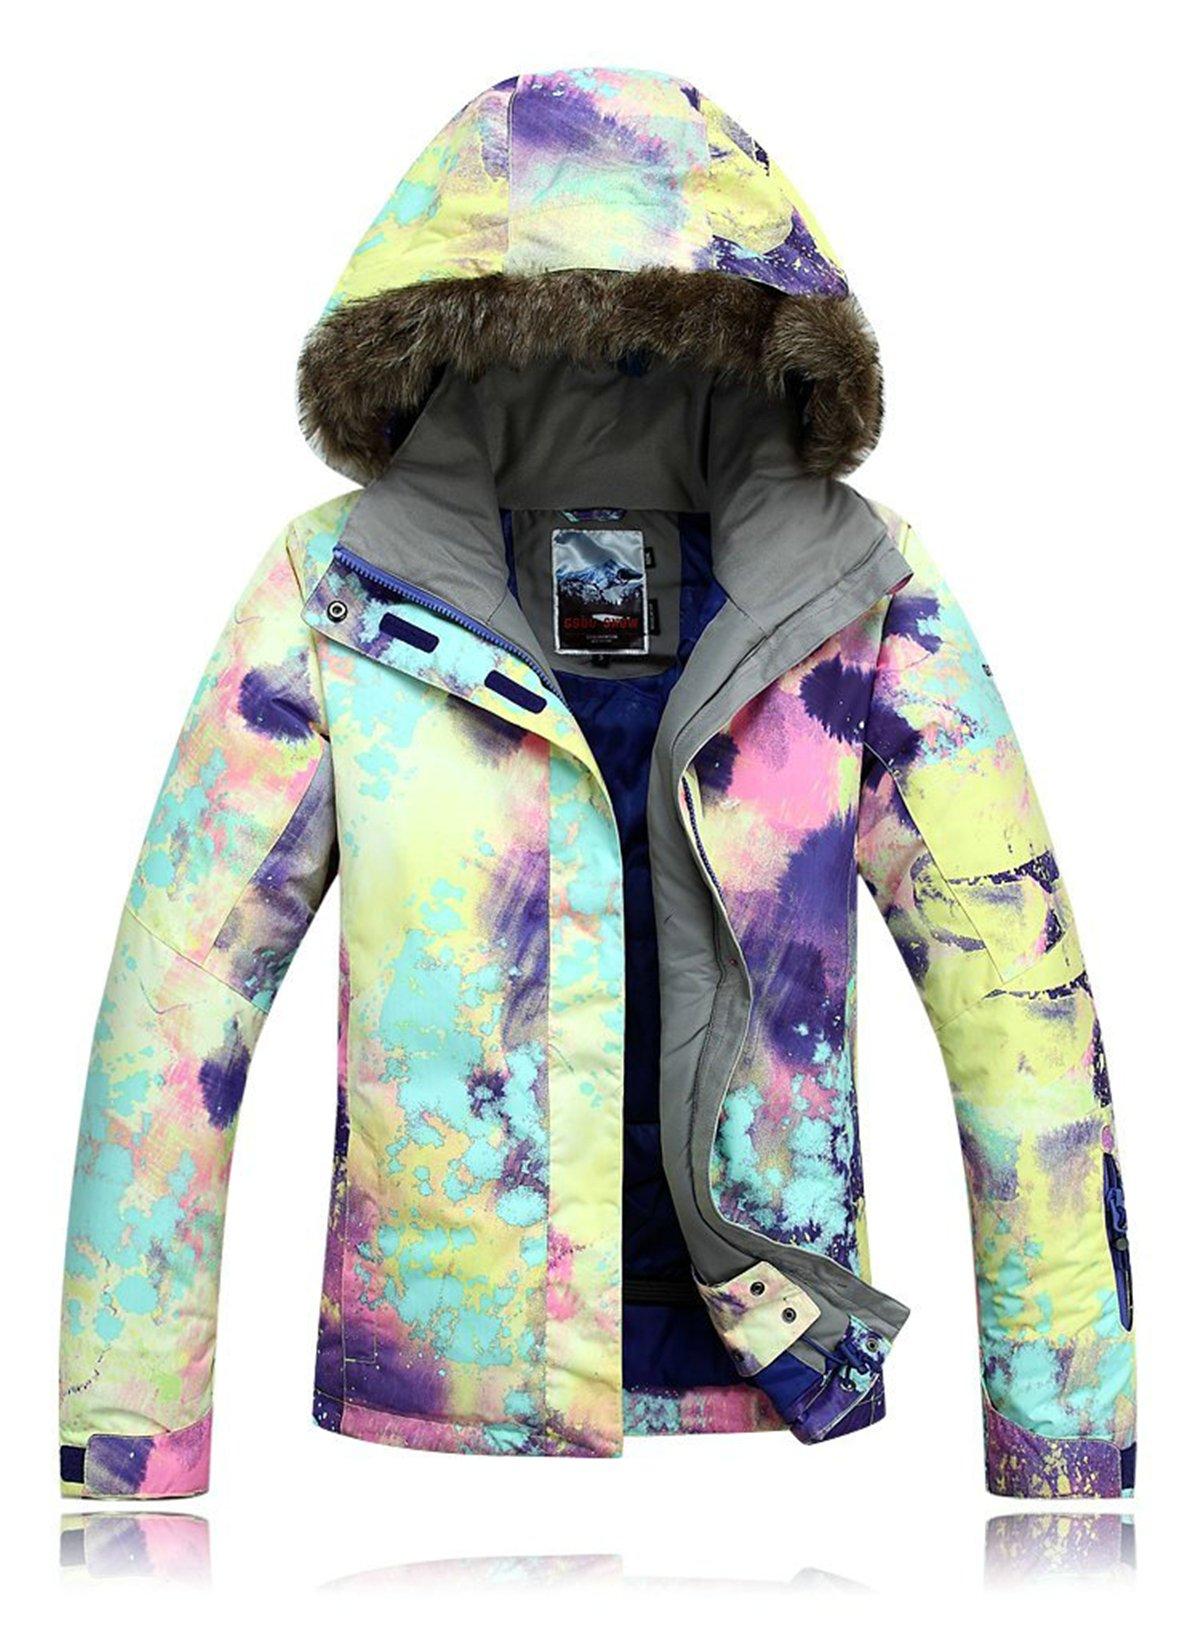 APTRO Women's High Windproof Technology Colorfull Printed Ski Jacket Style #21 Size S